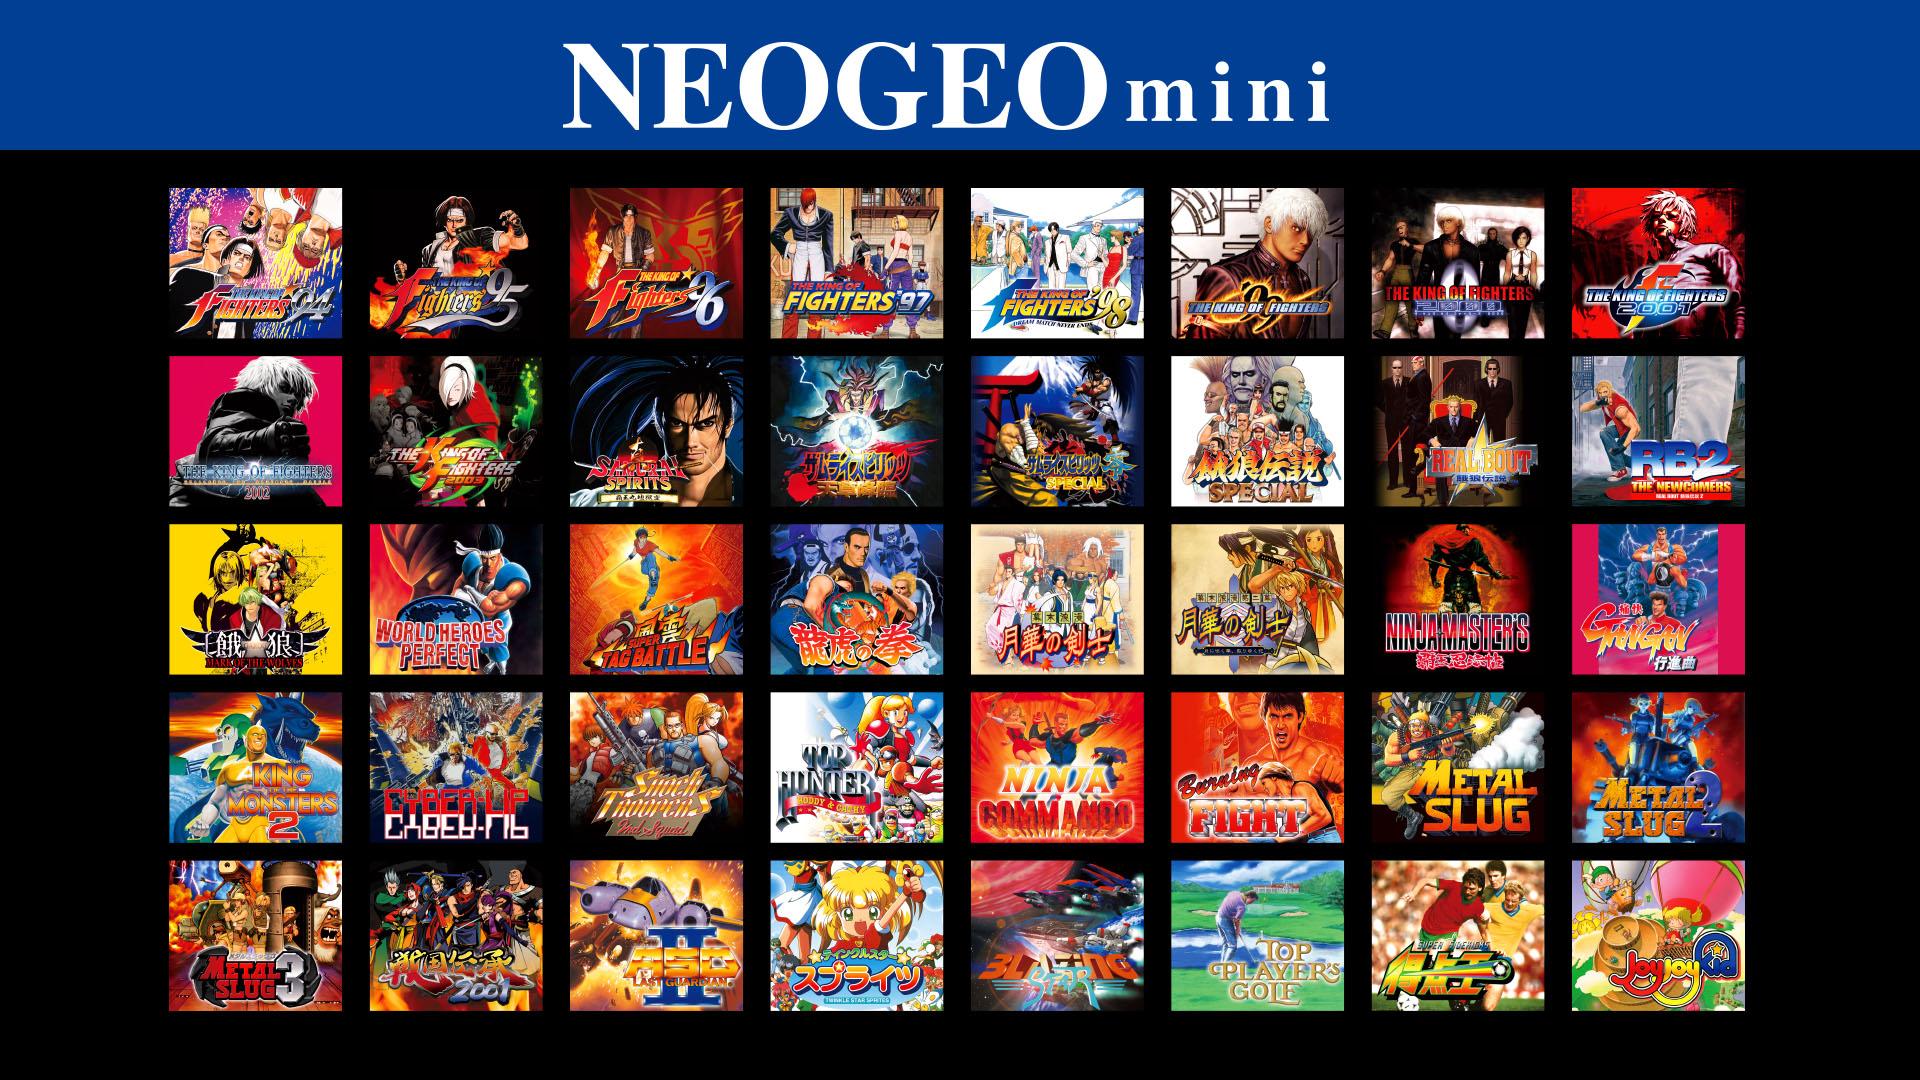 「NEOGEO mini」は7月24日に発売!11,500円(税別)で本日より予約開始!!